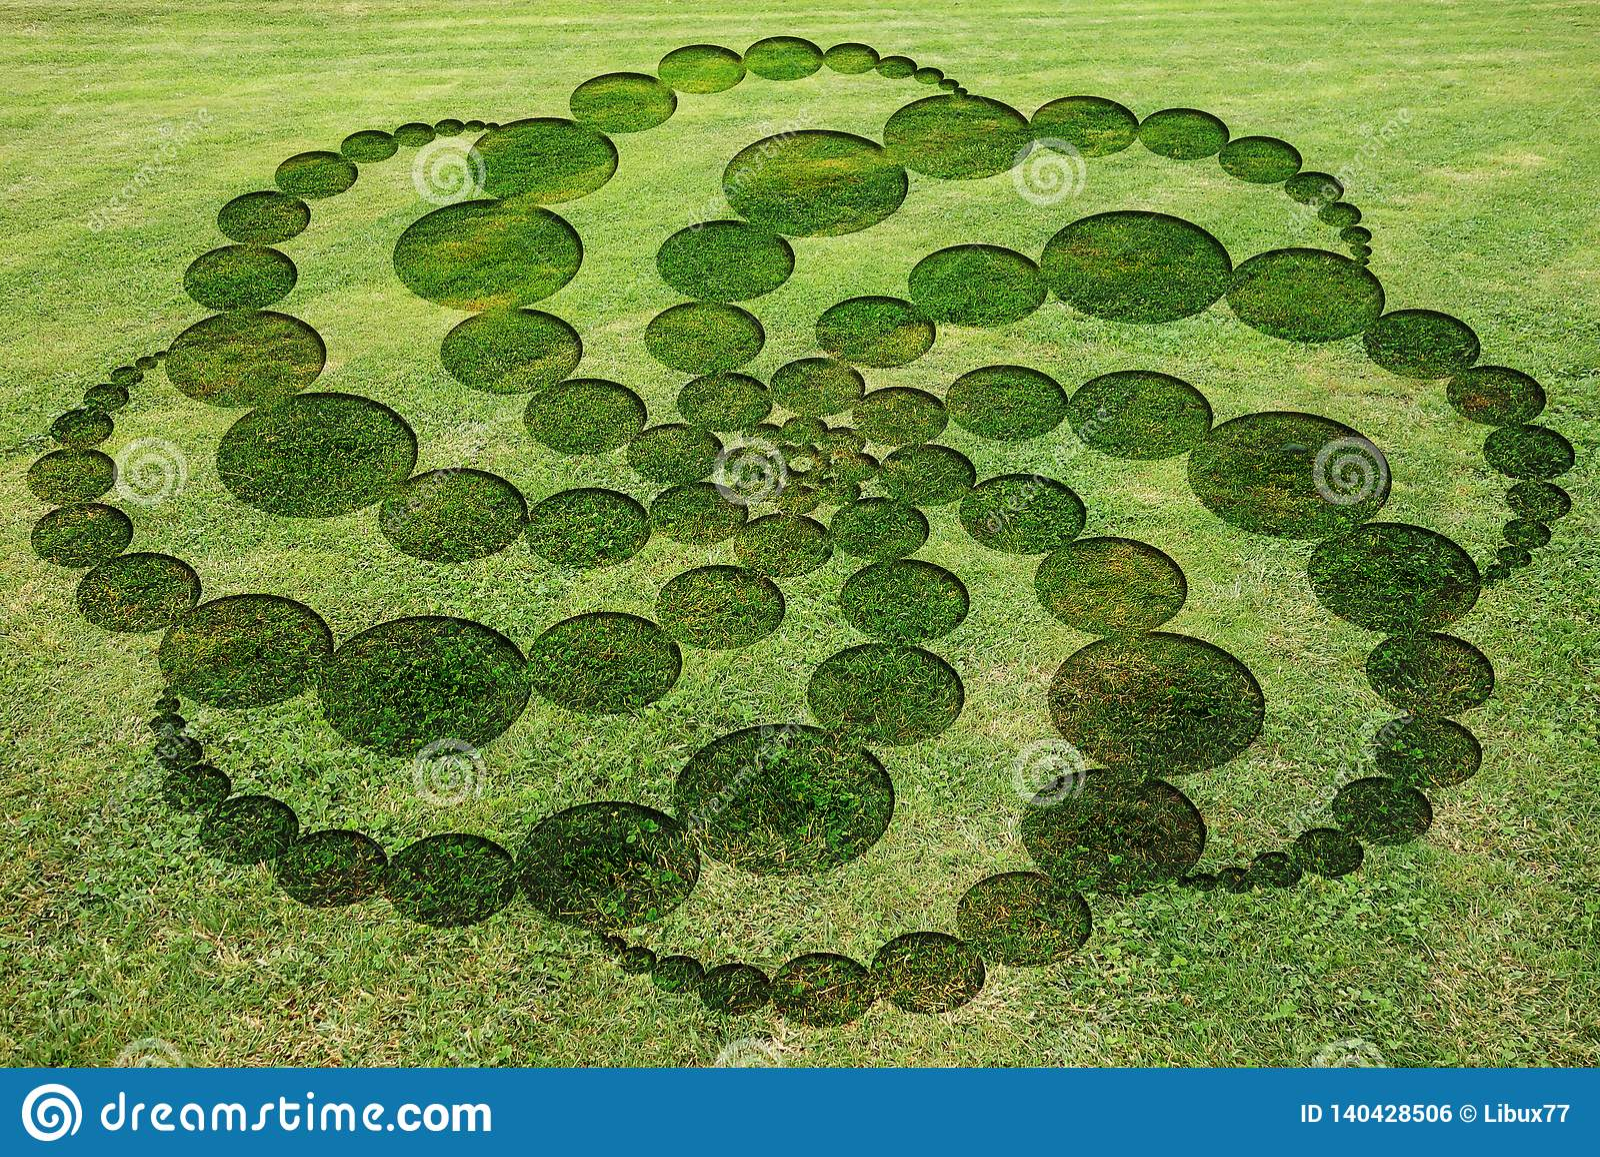 Concentric circles spirals encrypted symbols fake crop circle meadow